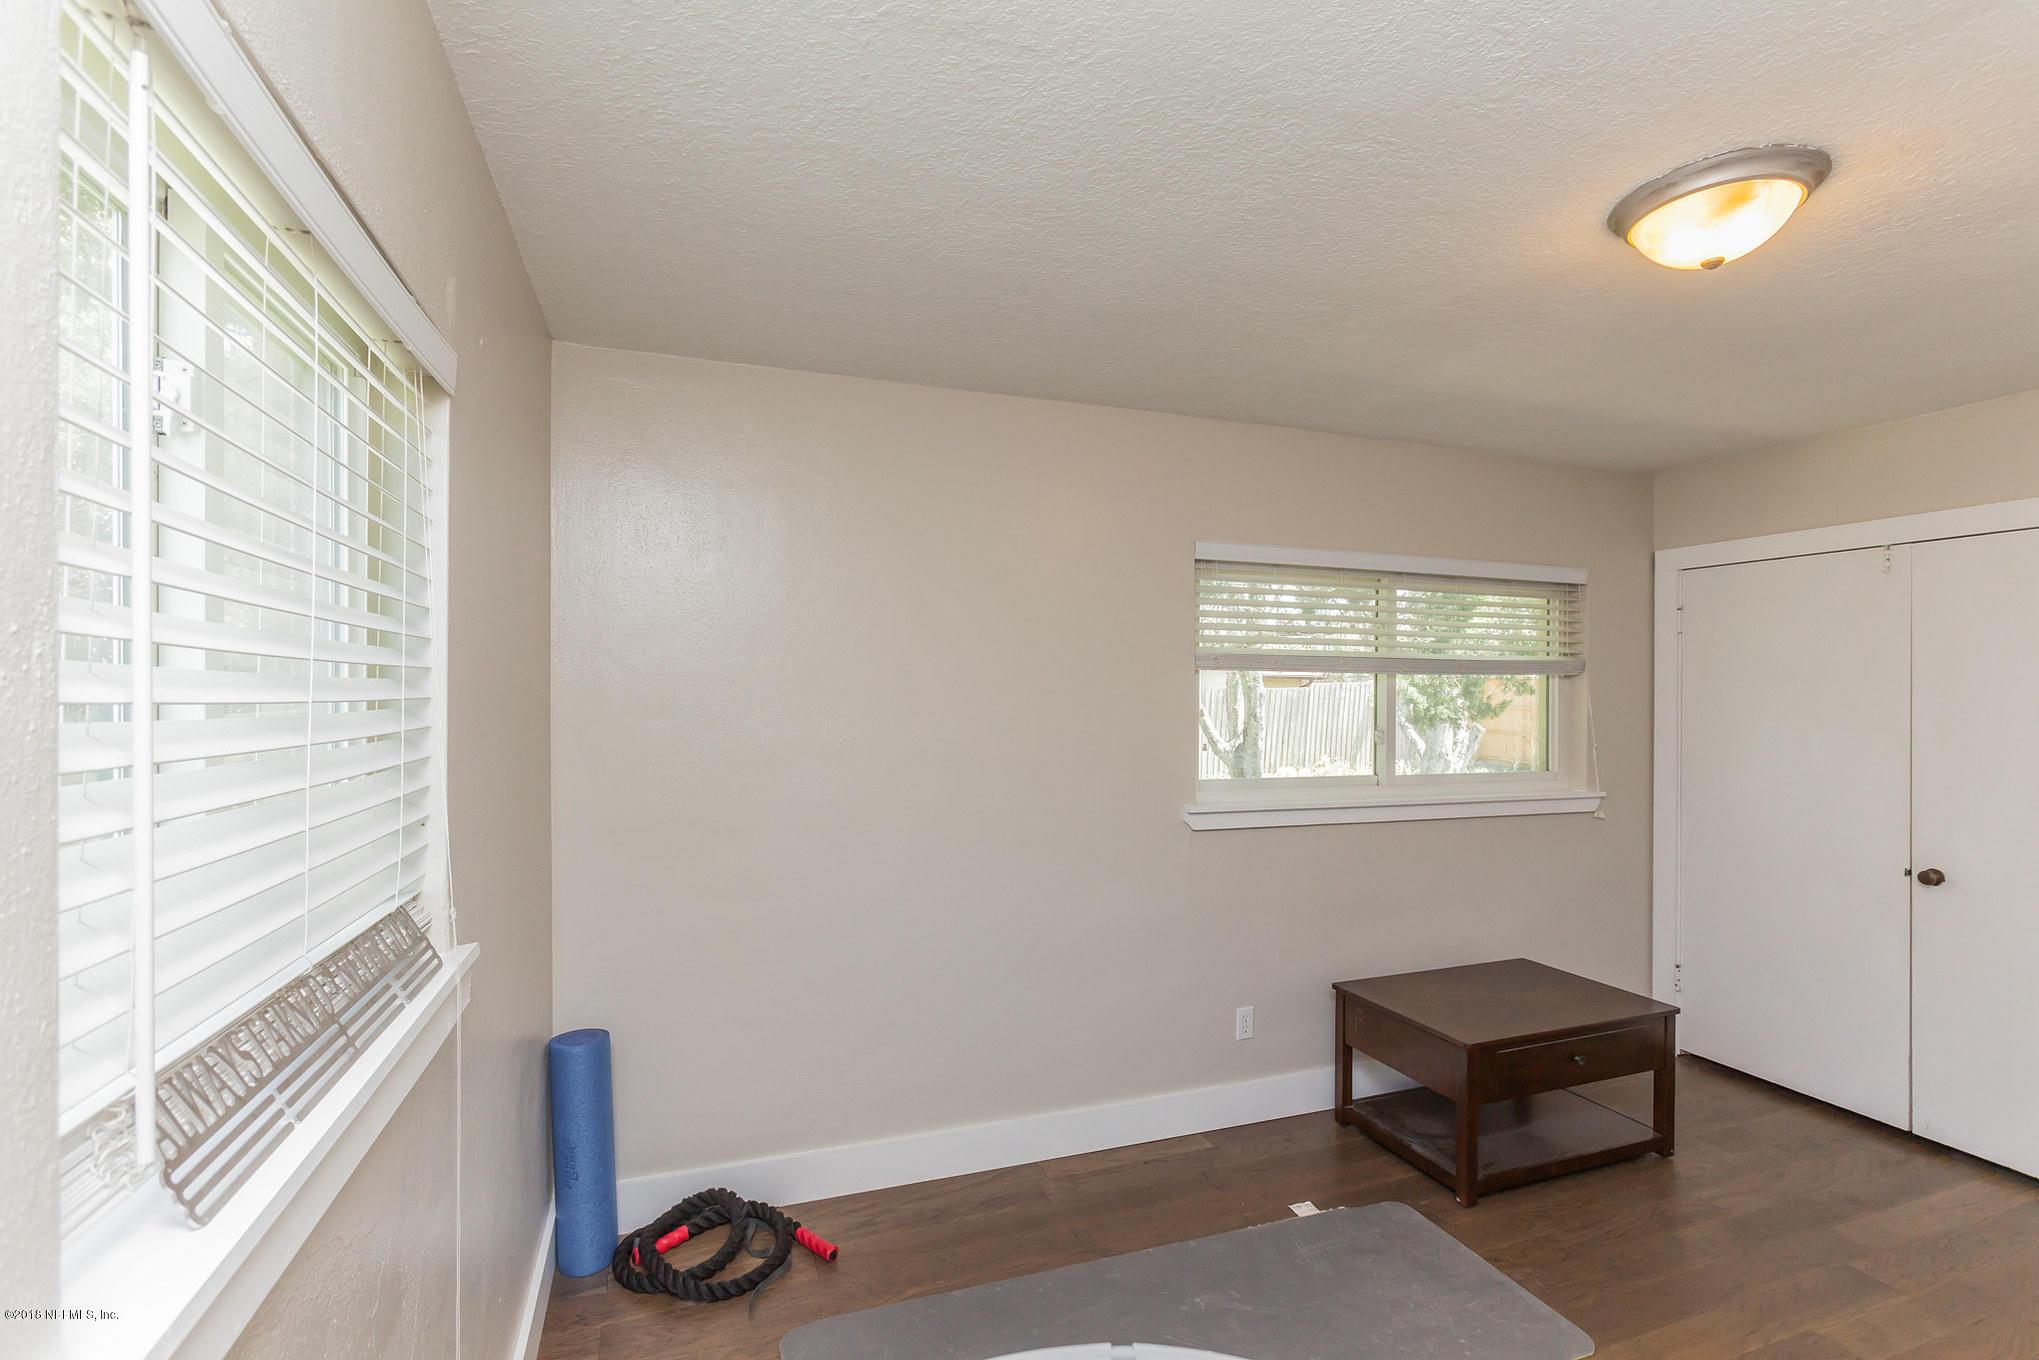 118 MENENDEZ, ST AUGUSTINE, FLORIDA 32080, 3 Bedrooms Bedrooms, ,2 BathroomsBathrooms,Residential - single family,For sale,MENENDEZ,954152